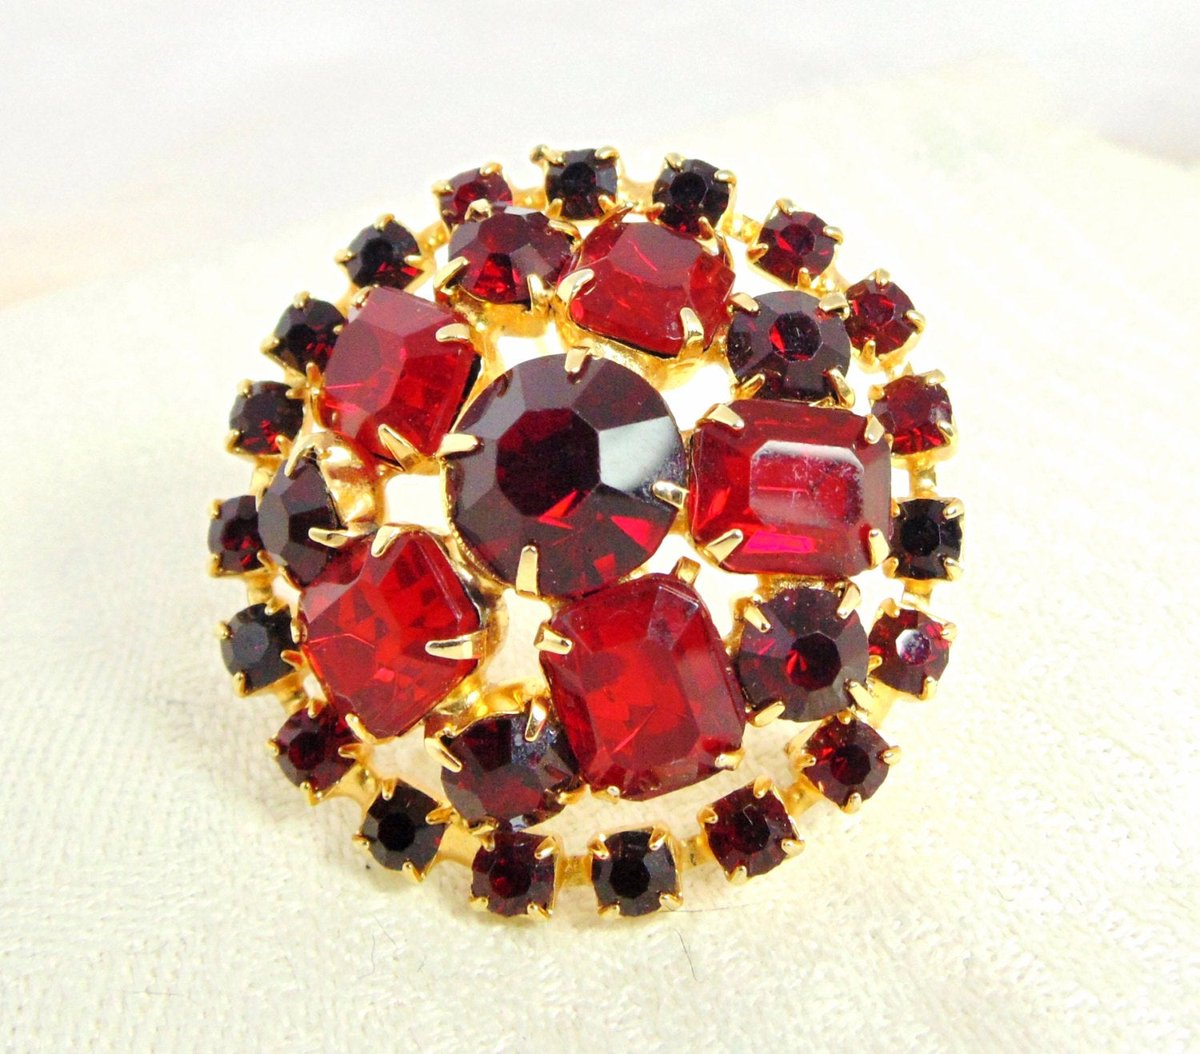 Exceptional Vintage Red Rhinestone Brooch https://t.co/d45DmZccSX #pottiteam #jewelry #vintage #ProngSet https://t.co/EaU0RSQfmX